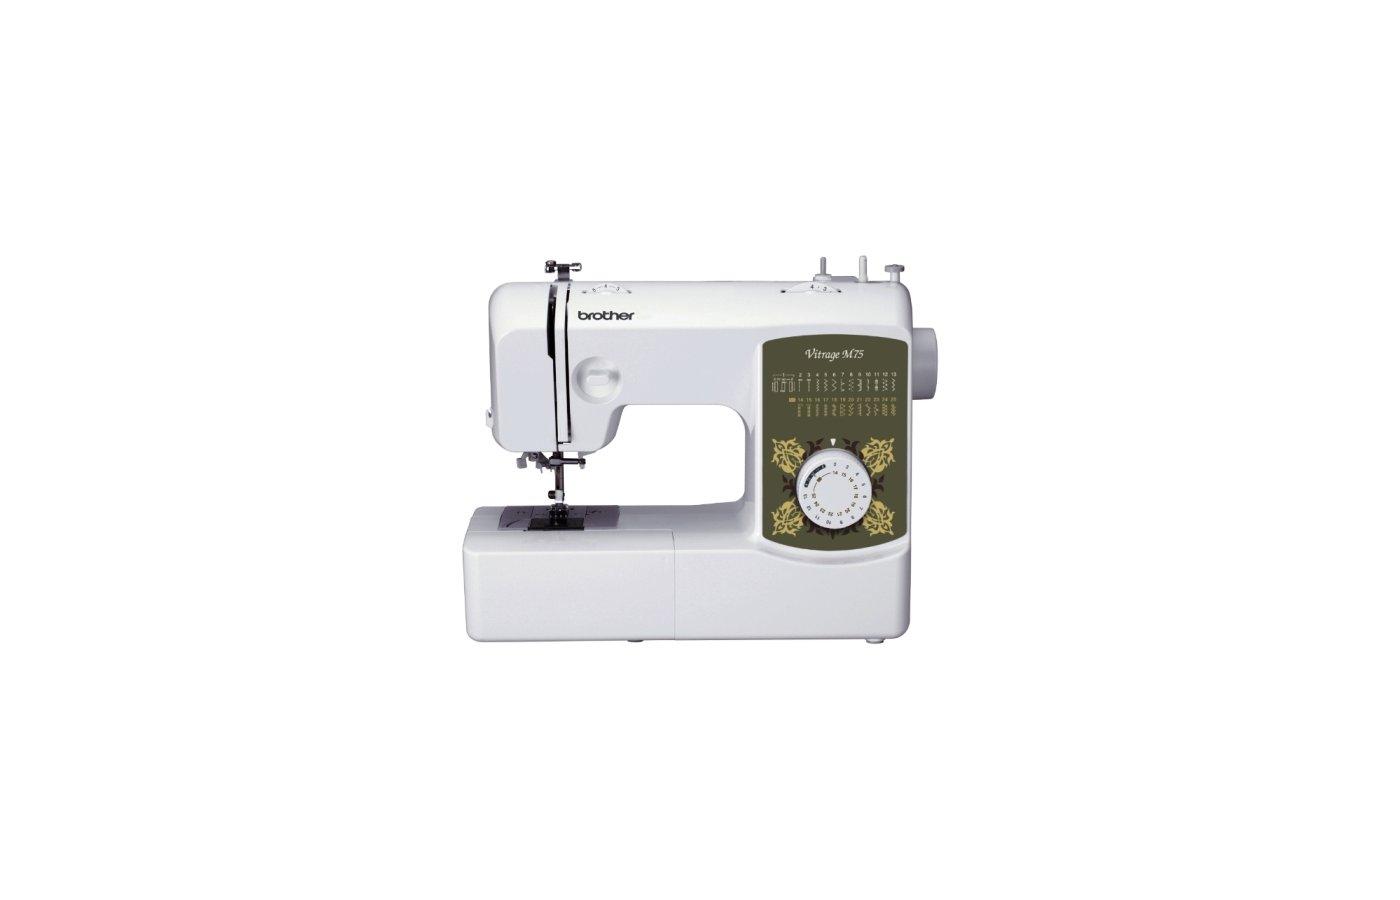 Швейная машина BROTHER Vitrage M 75